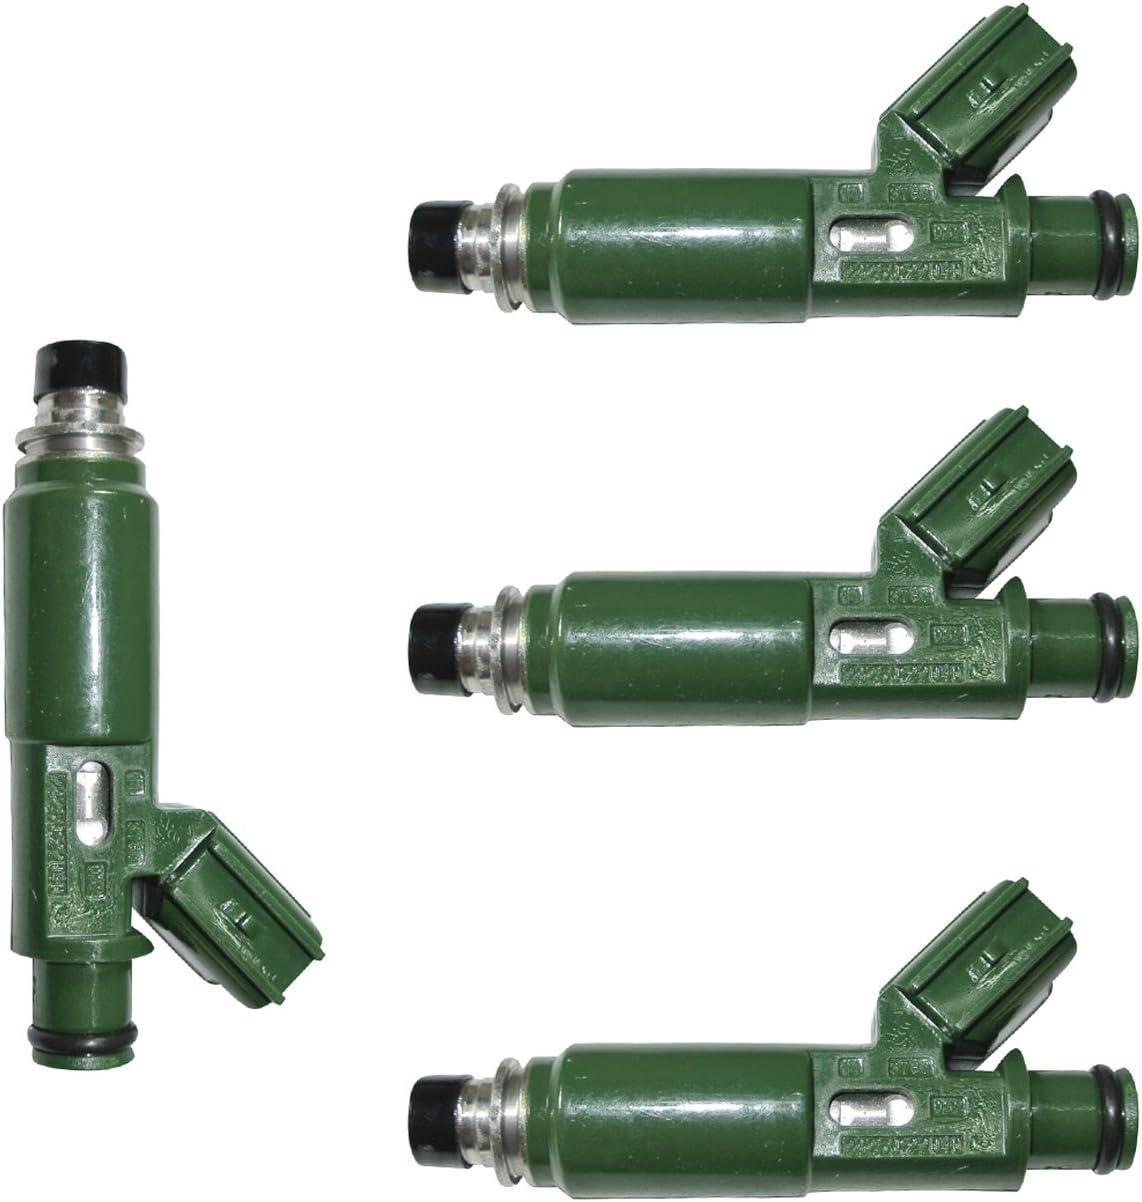 Fuel Injector 23250-22040 For Toyota Celica Corolla Matrix MR2 Spyder 1.8L 1ZZFE